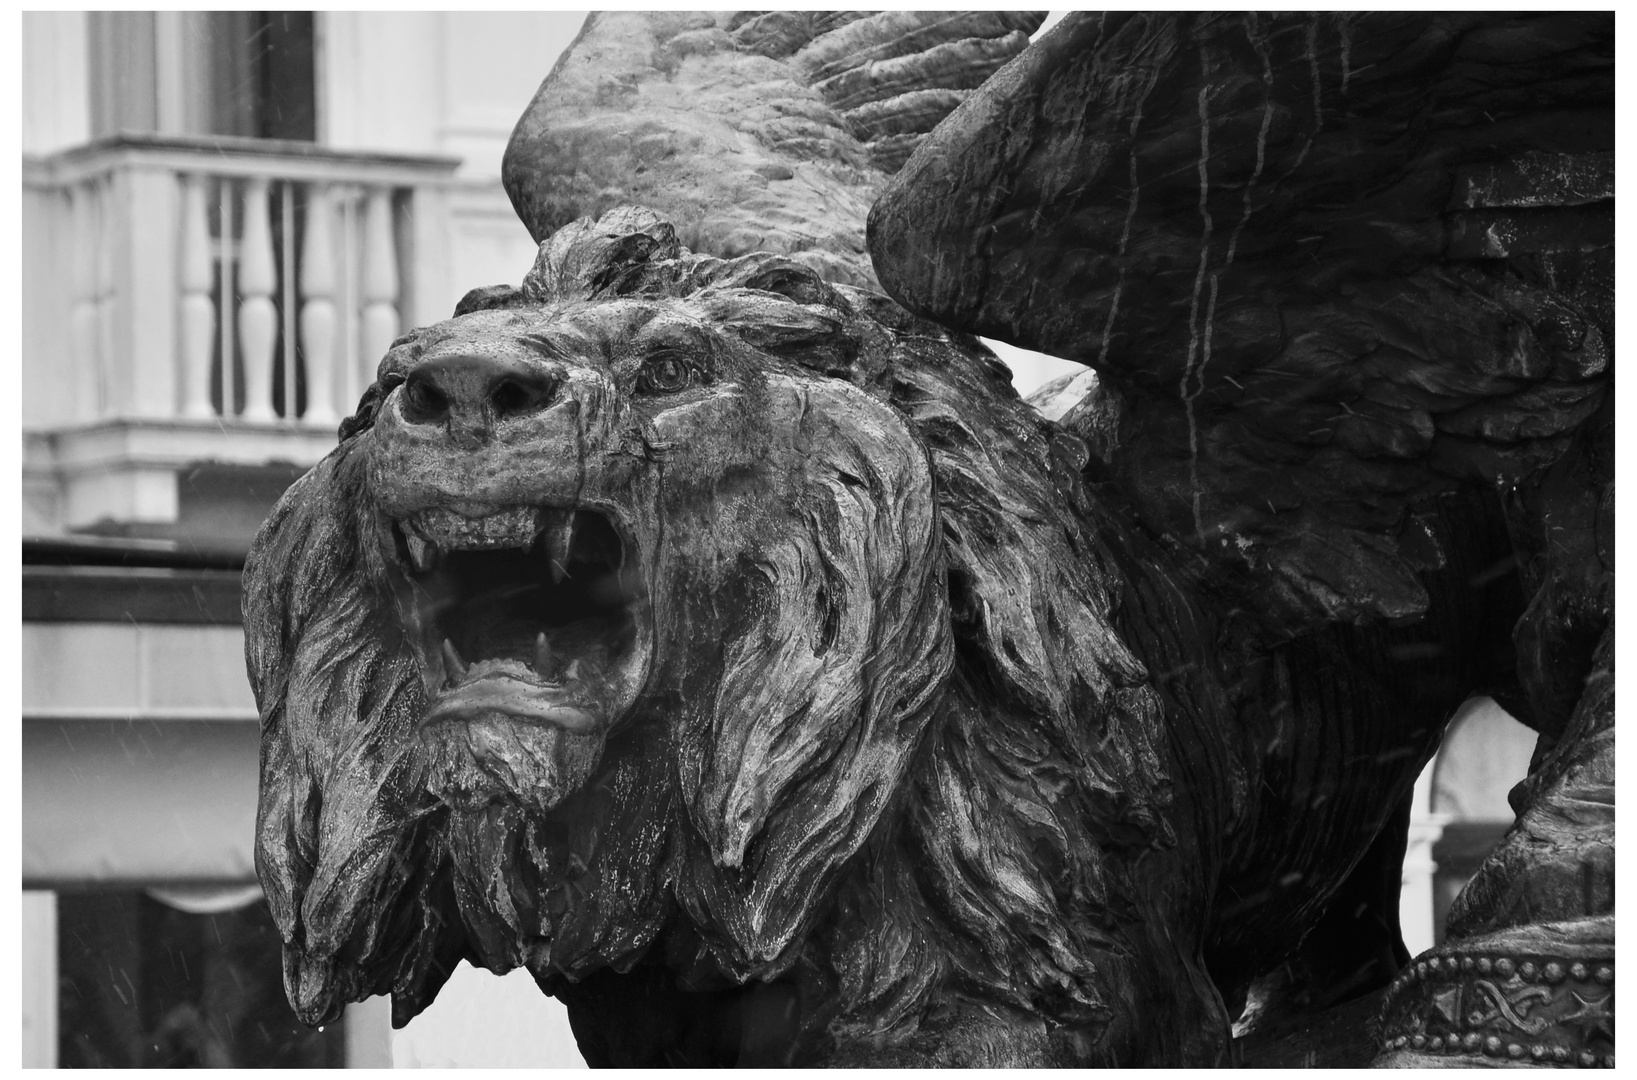 Lions of Venice 2